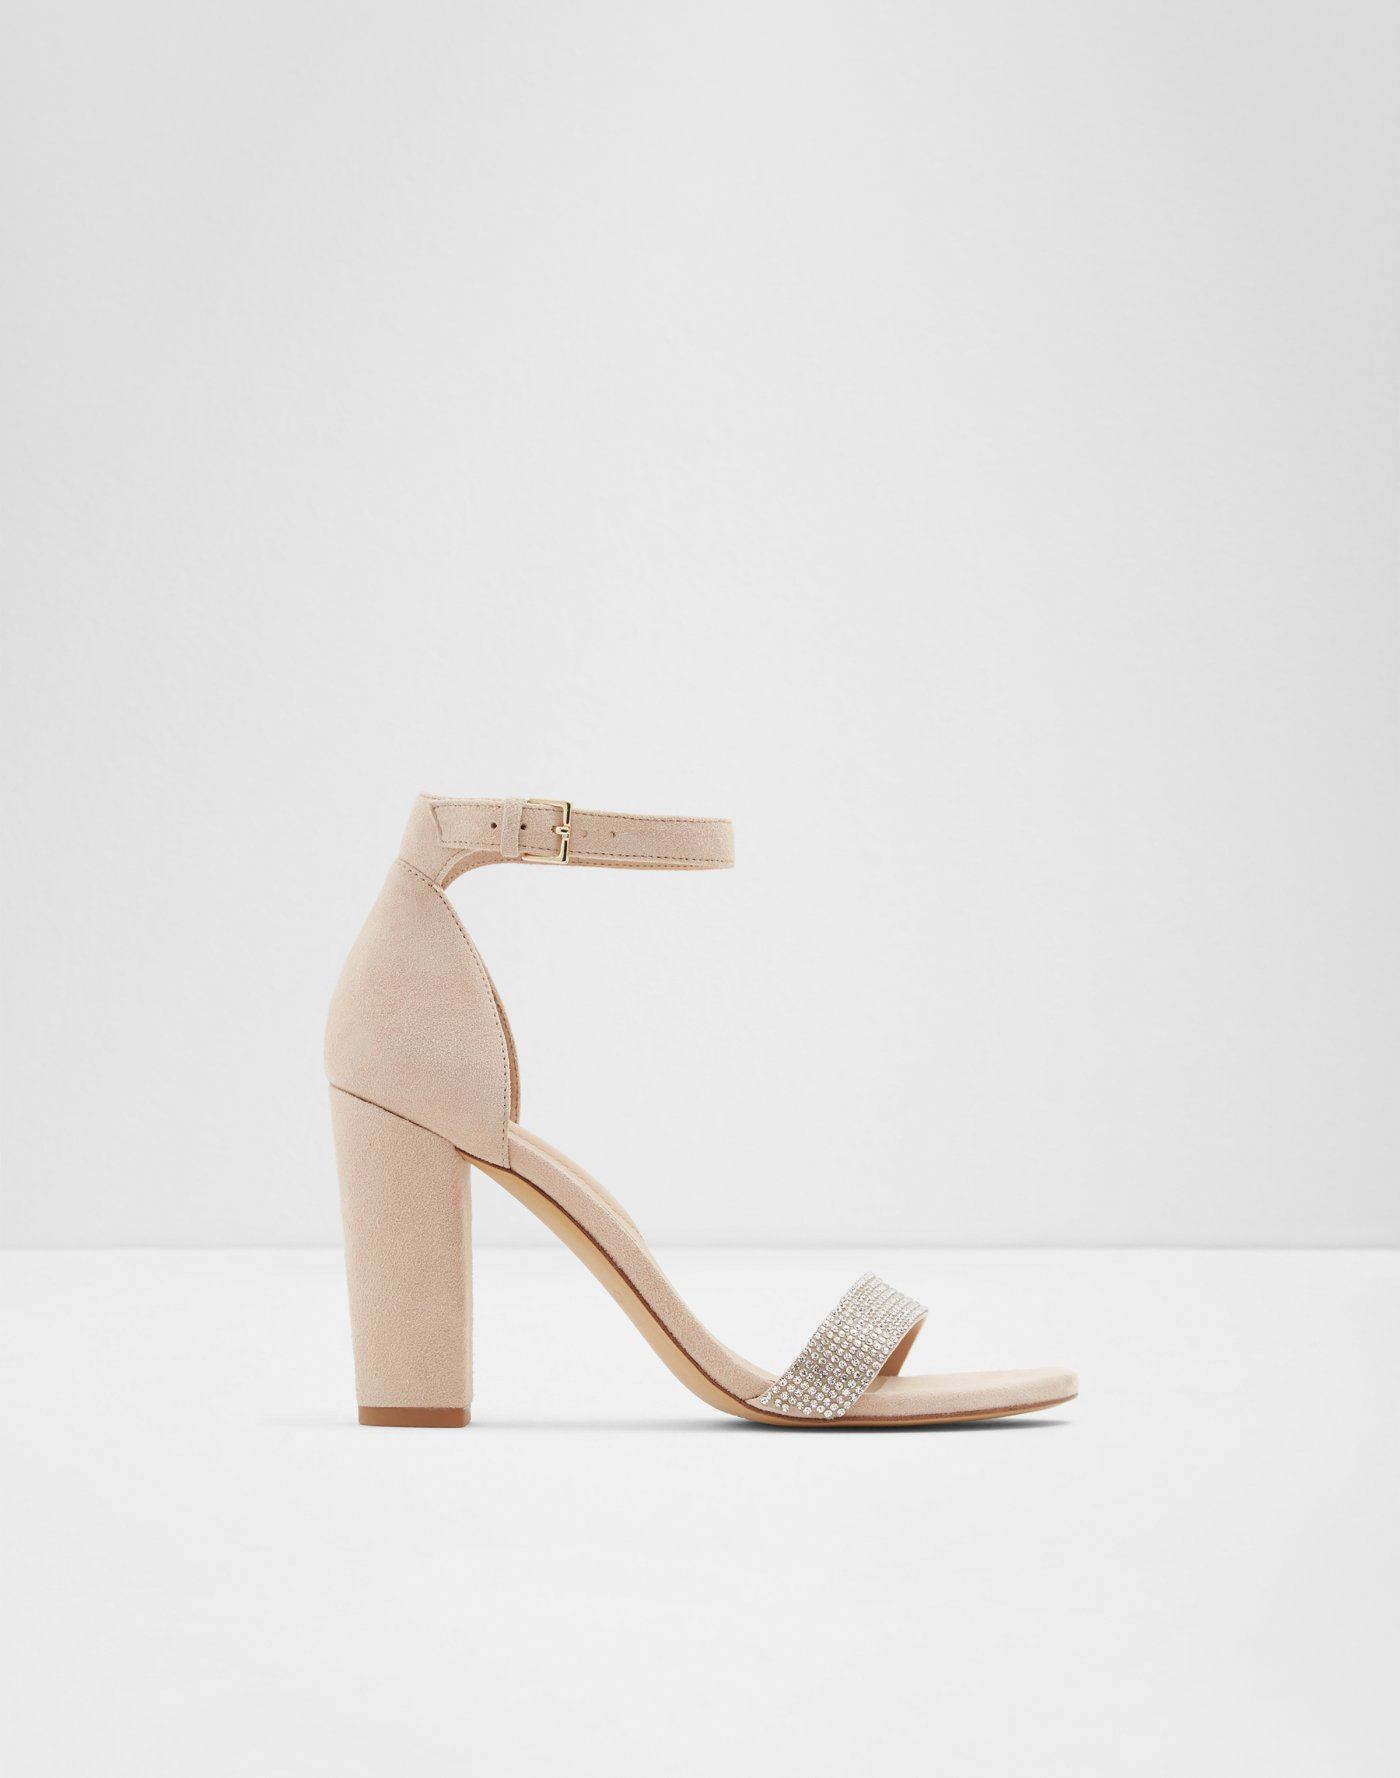 1e469f9528b7 Sandals for Women | Slides & Gladiator Sandals | ALDO US | Aldoshoes.com US